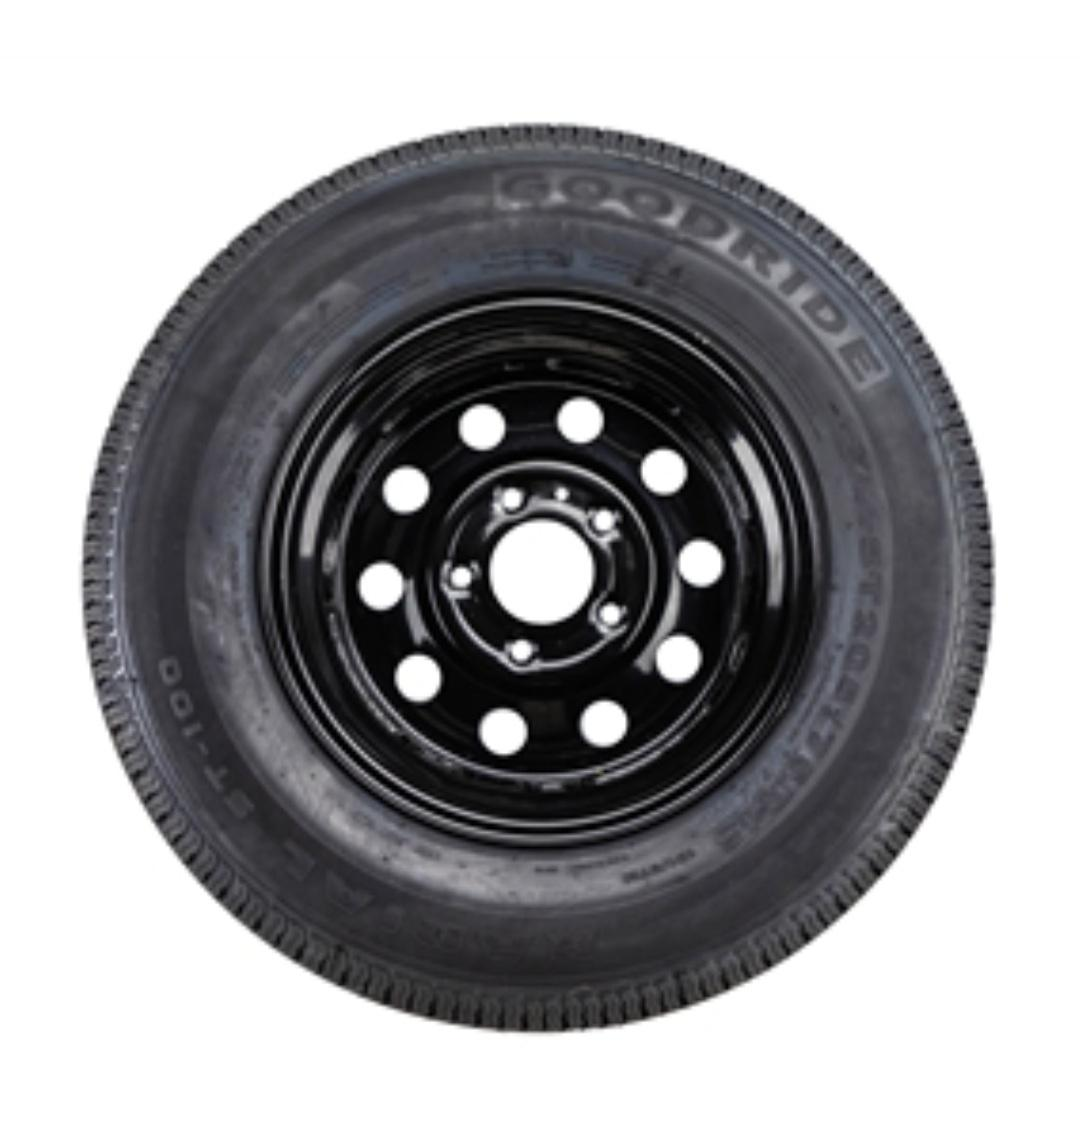 ST205/75R15 Goodride 2 colors- Rim and Wheel